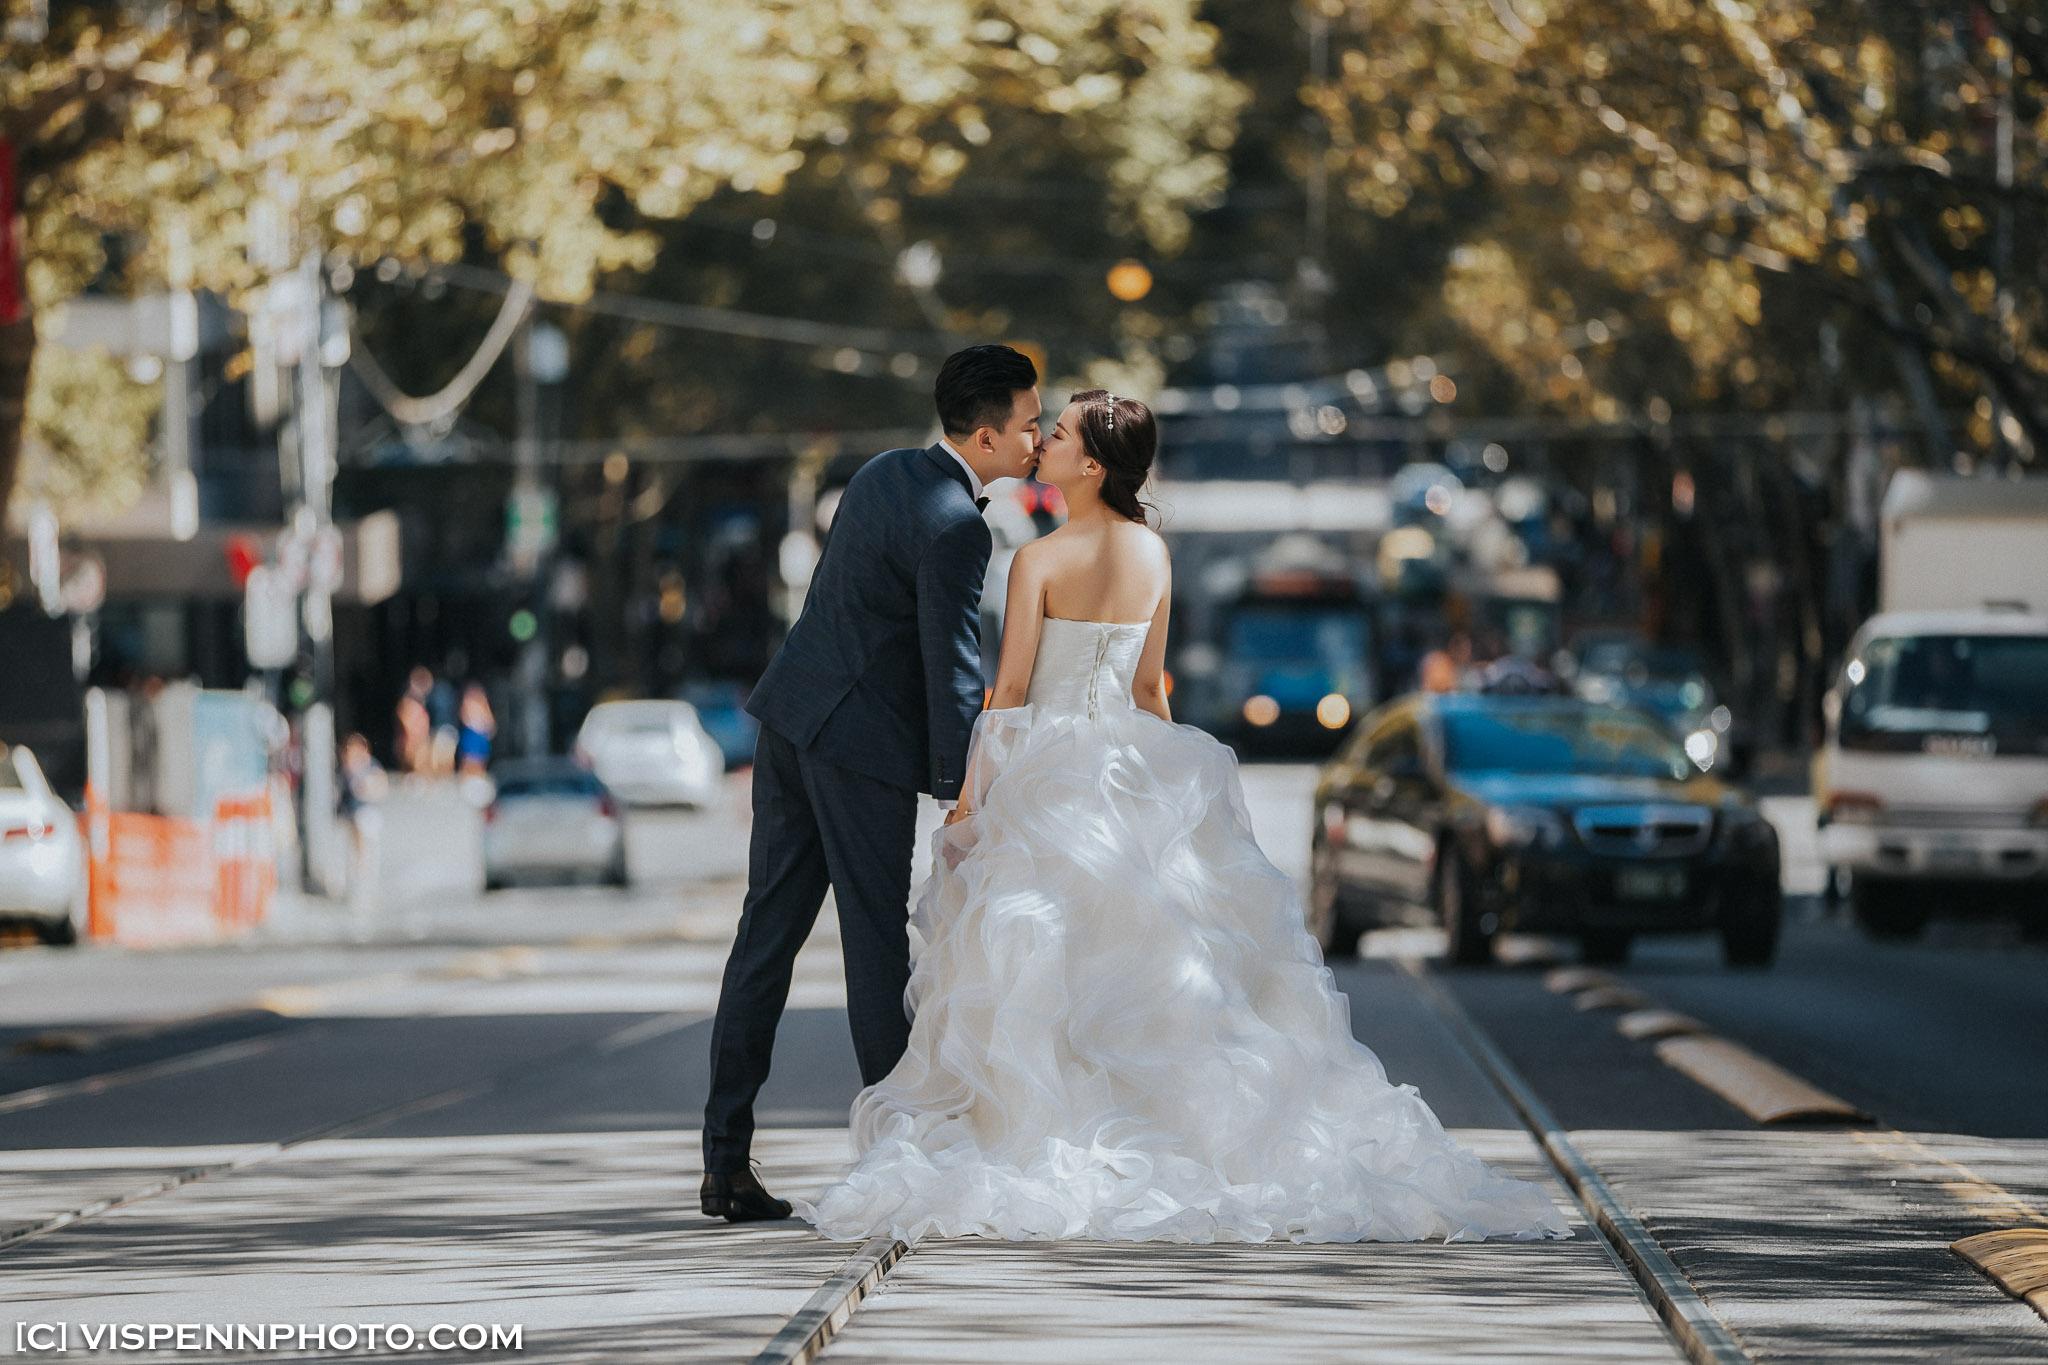 PRE WEDDING Photography Melbourne VISPENN 墨尔本 婚纱照 结婚照 婚纱摄影 AndyCHEN 2928 1DX VISPENN